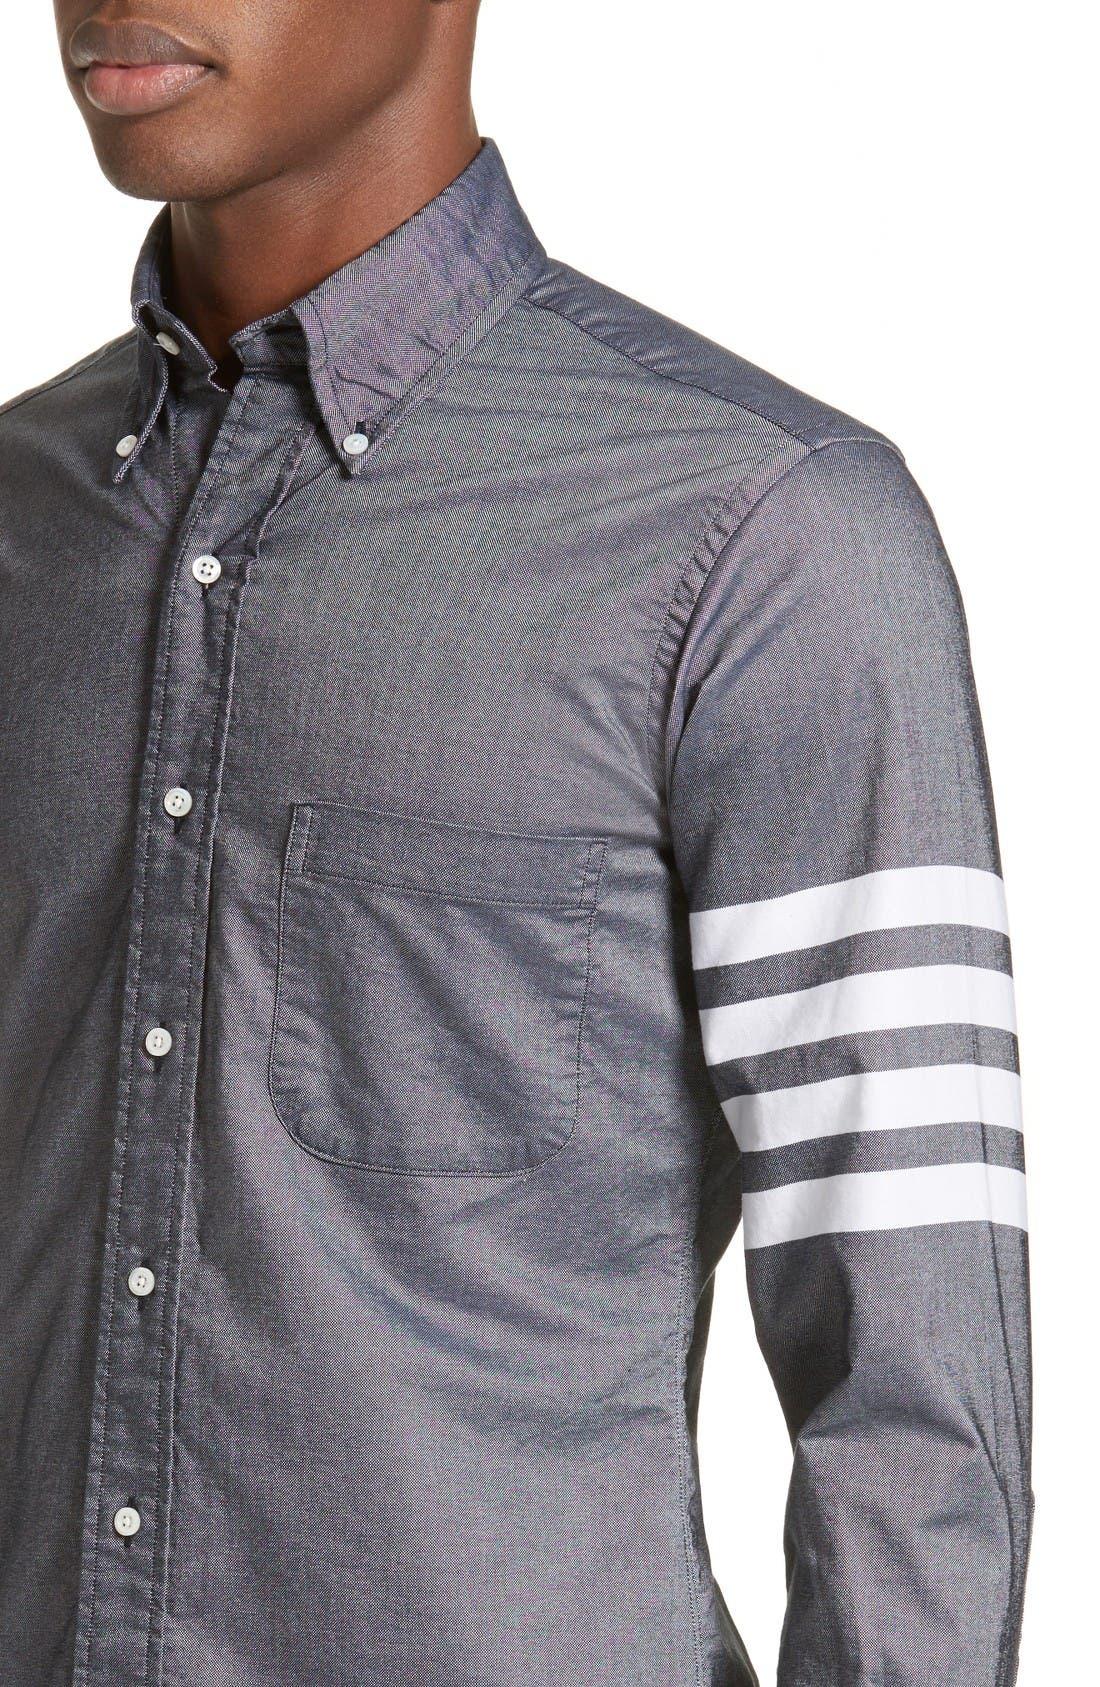 Trim Fit Classic 4-Bar Oxford Shirt,                             Alternate thumbnail 4, color,                             Dark Blue